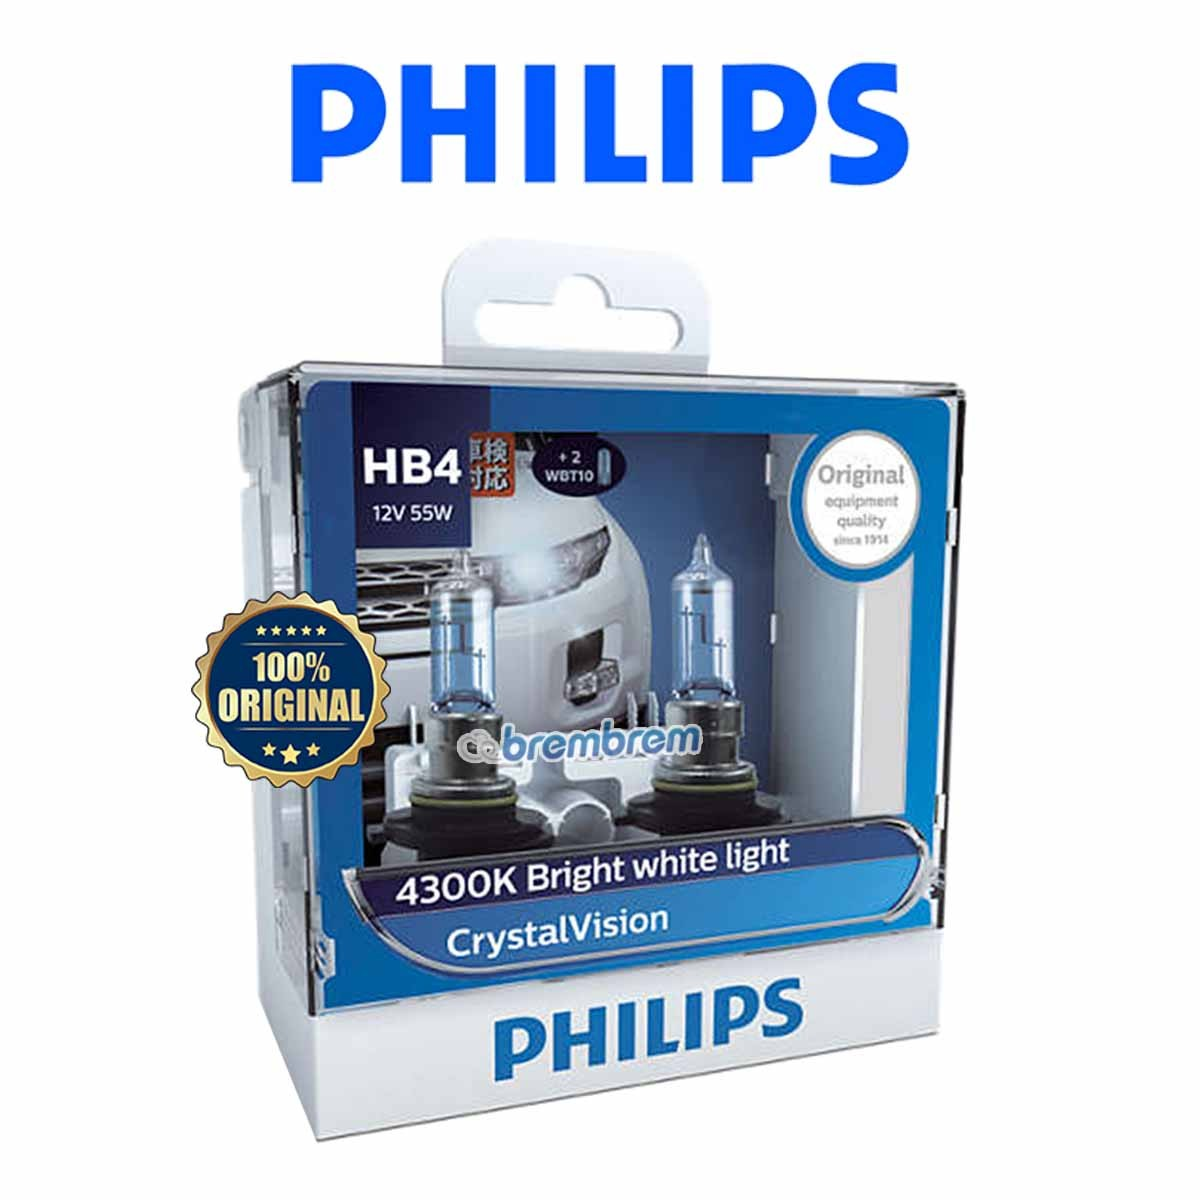 PHILIPS CRYSTAL VISION HB4 (4300K) - LAMPU HALOGEN